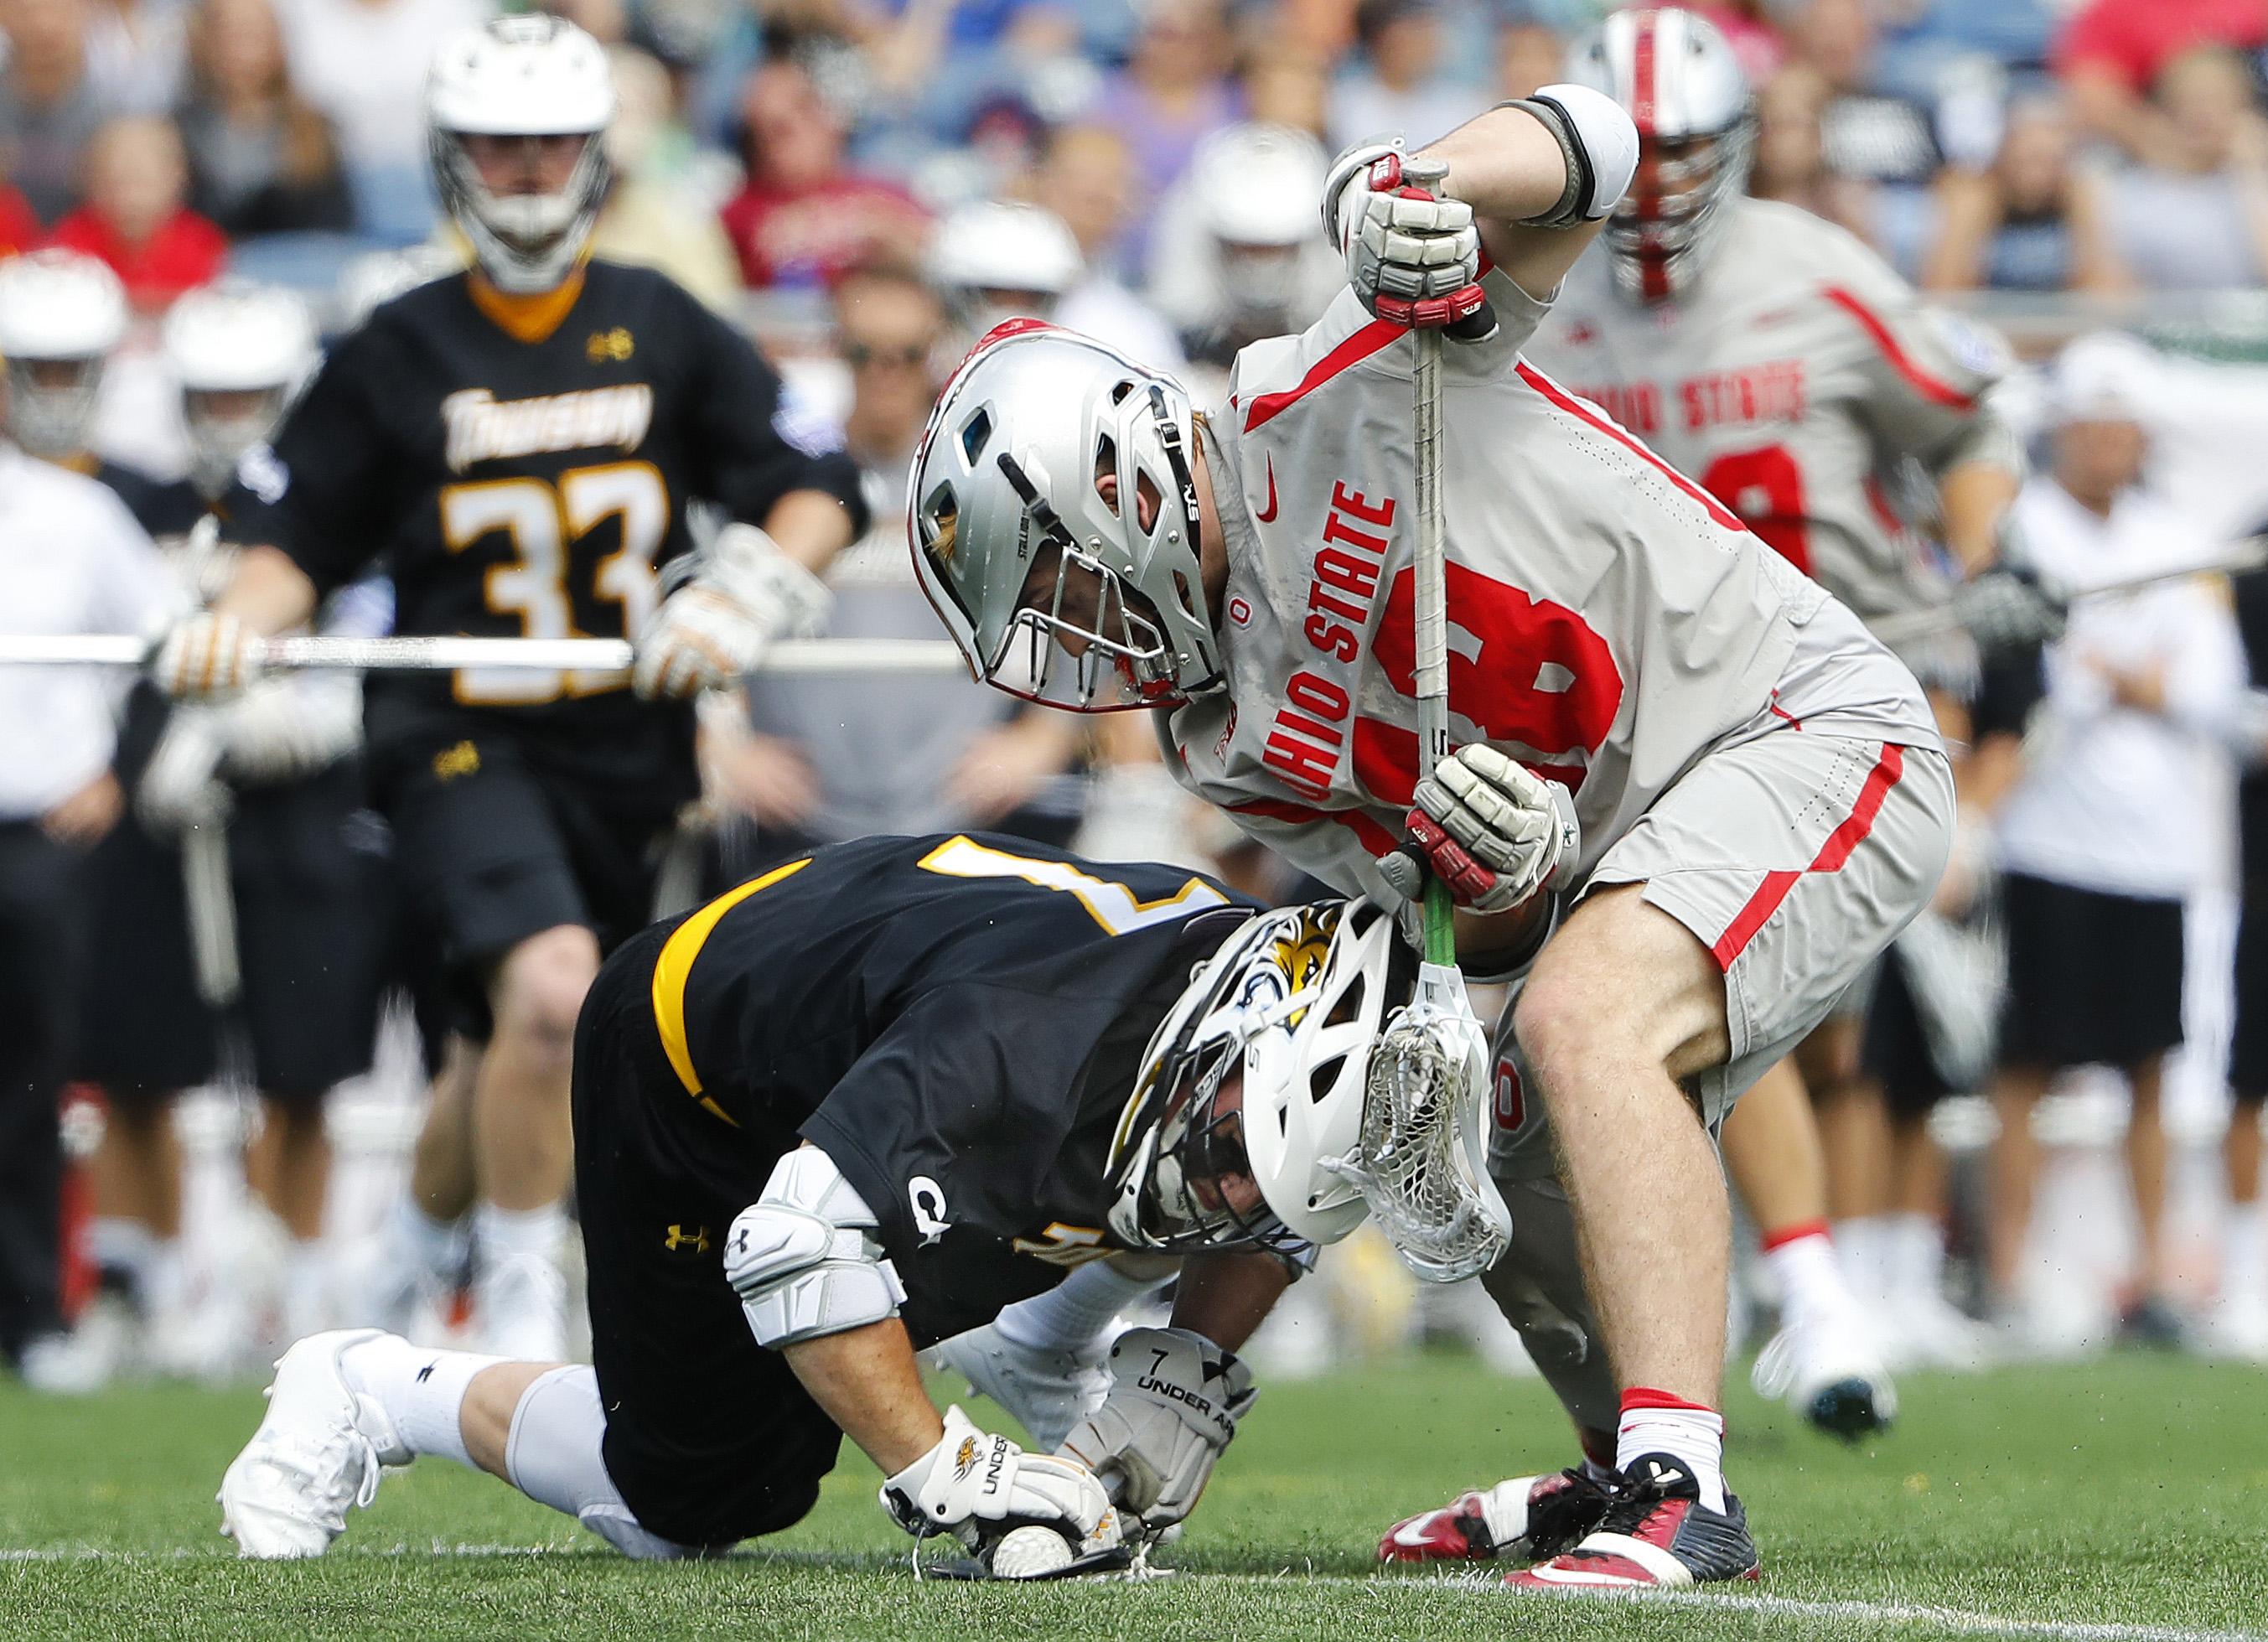 NCAA Lacrosse: Men's Championship